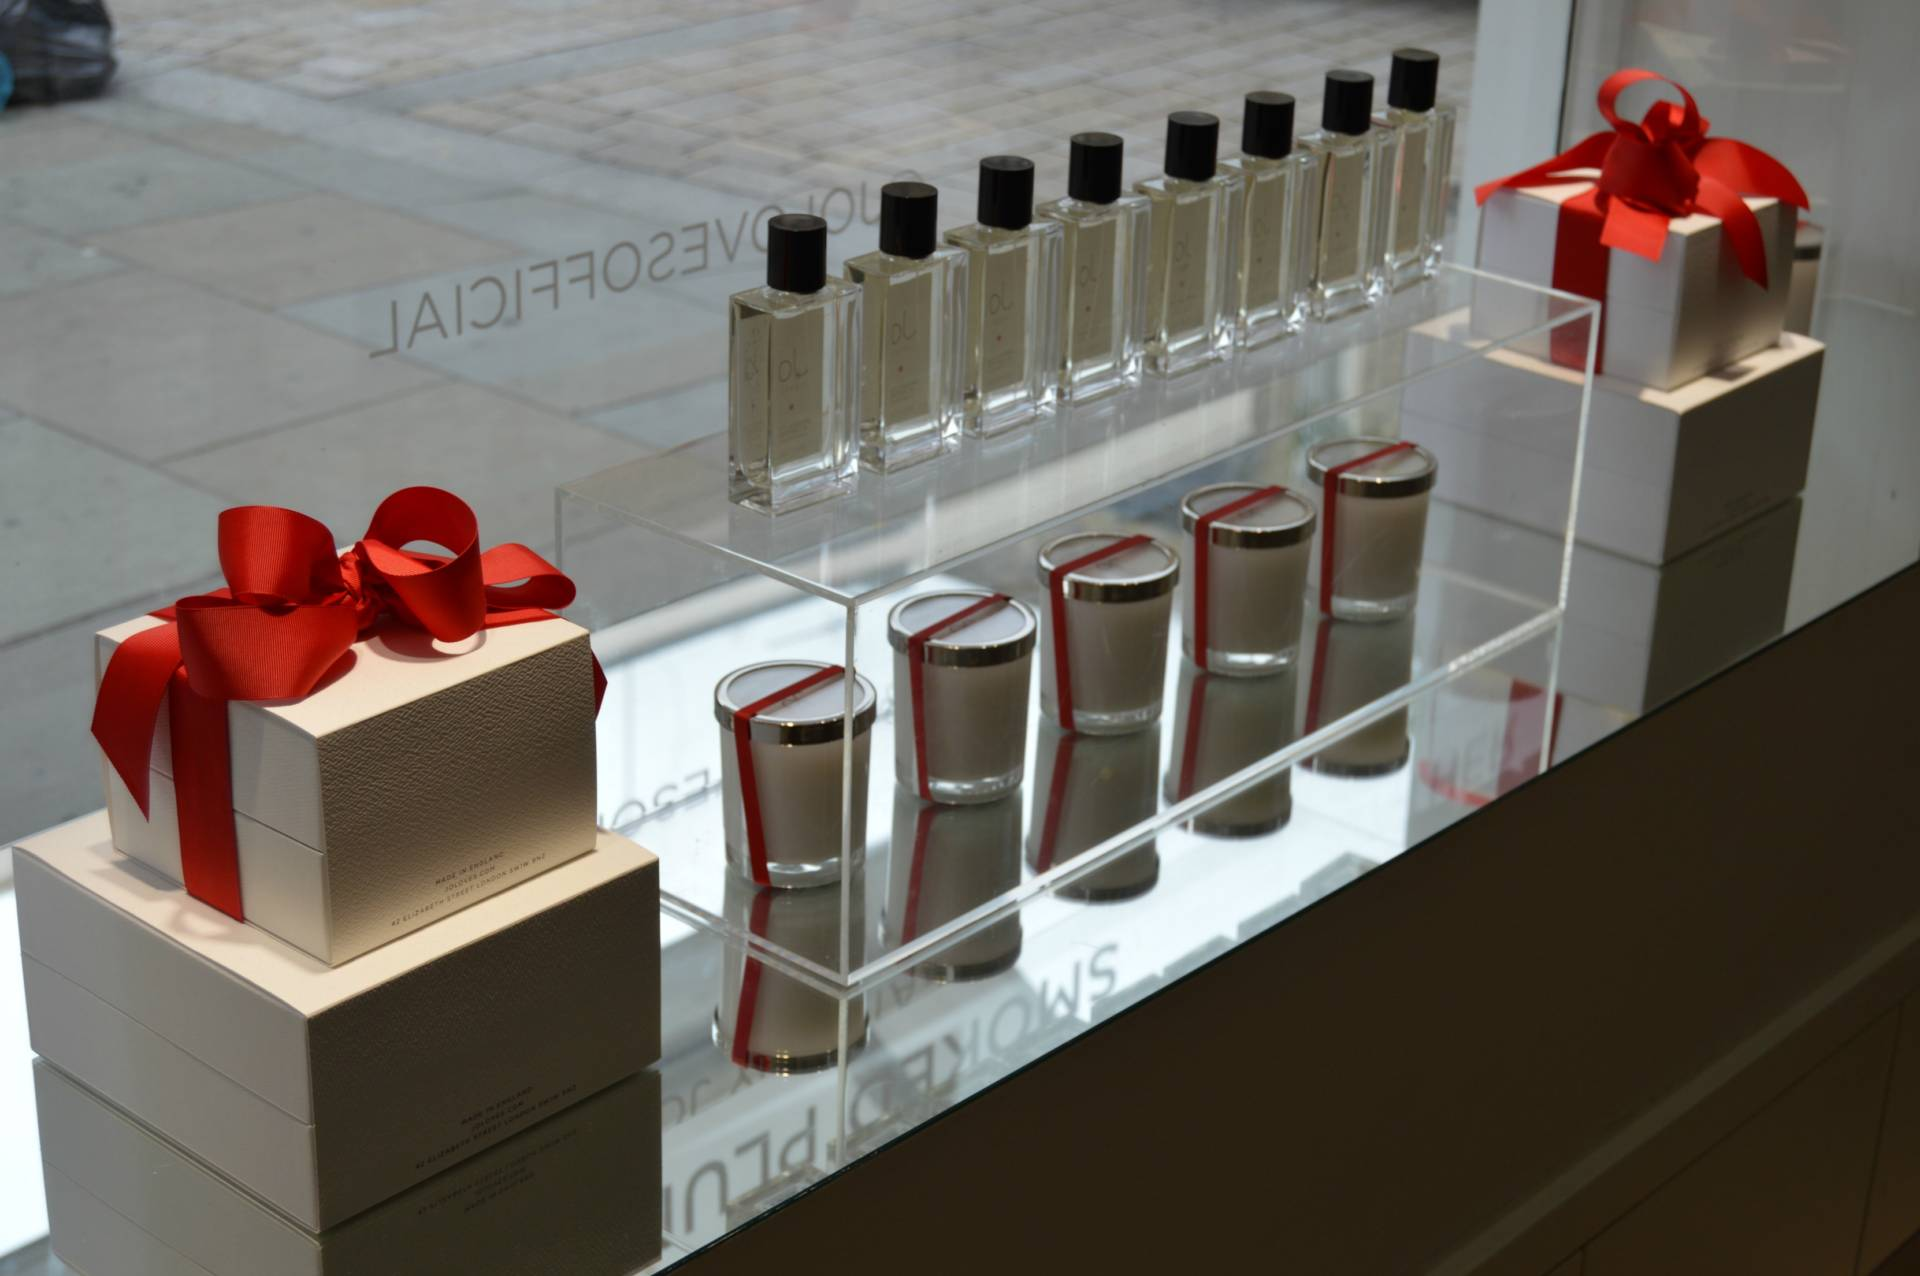 jo-loves-elizabeth-street-store-window-travel-inhautepursuit-shopping